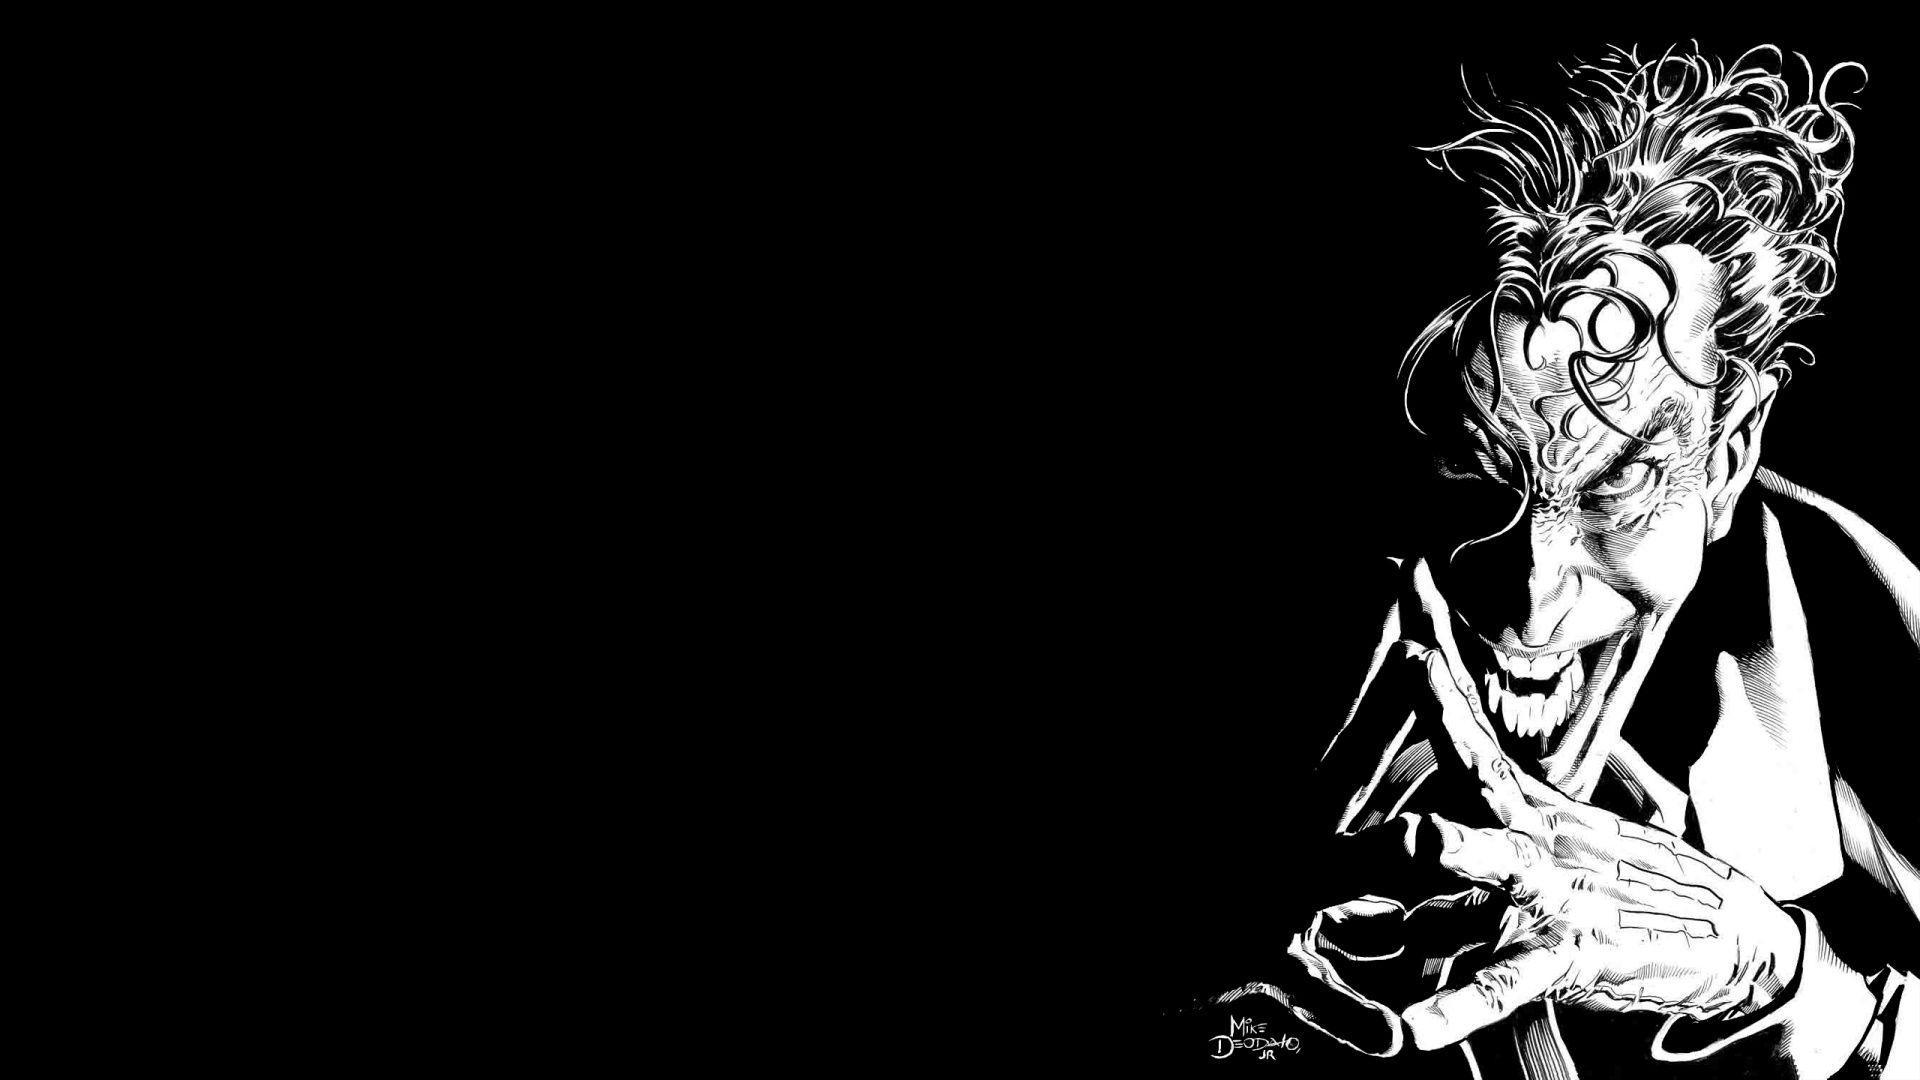 Joker Black And White Wallpapers Top Free Joker Black And